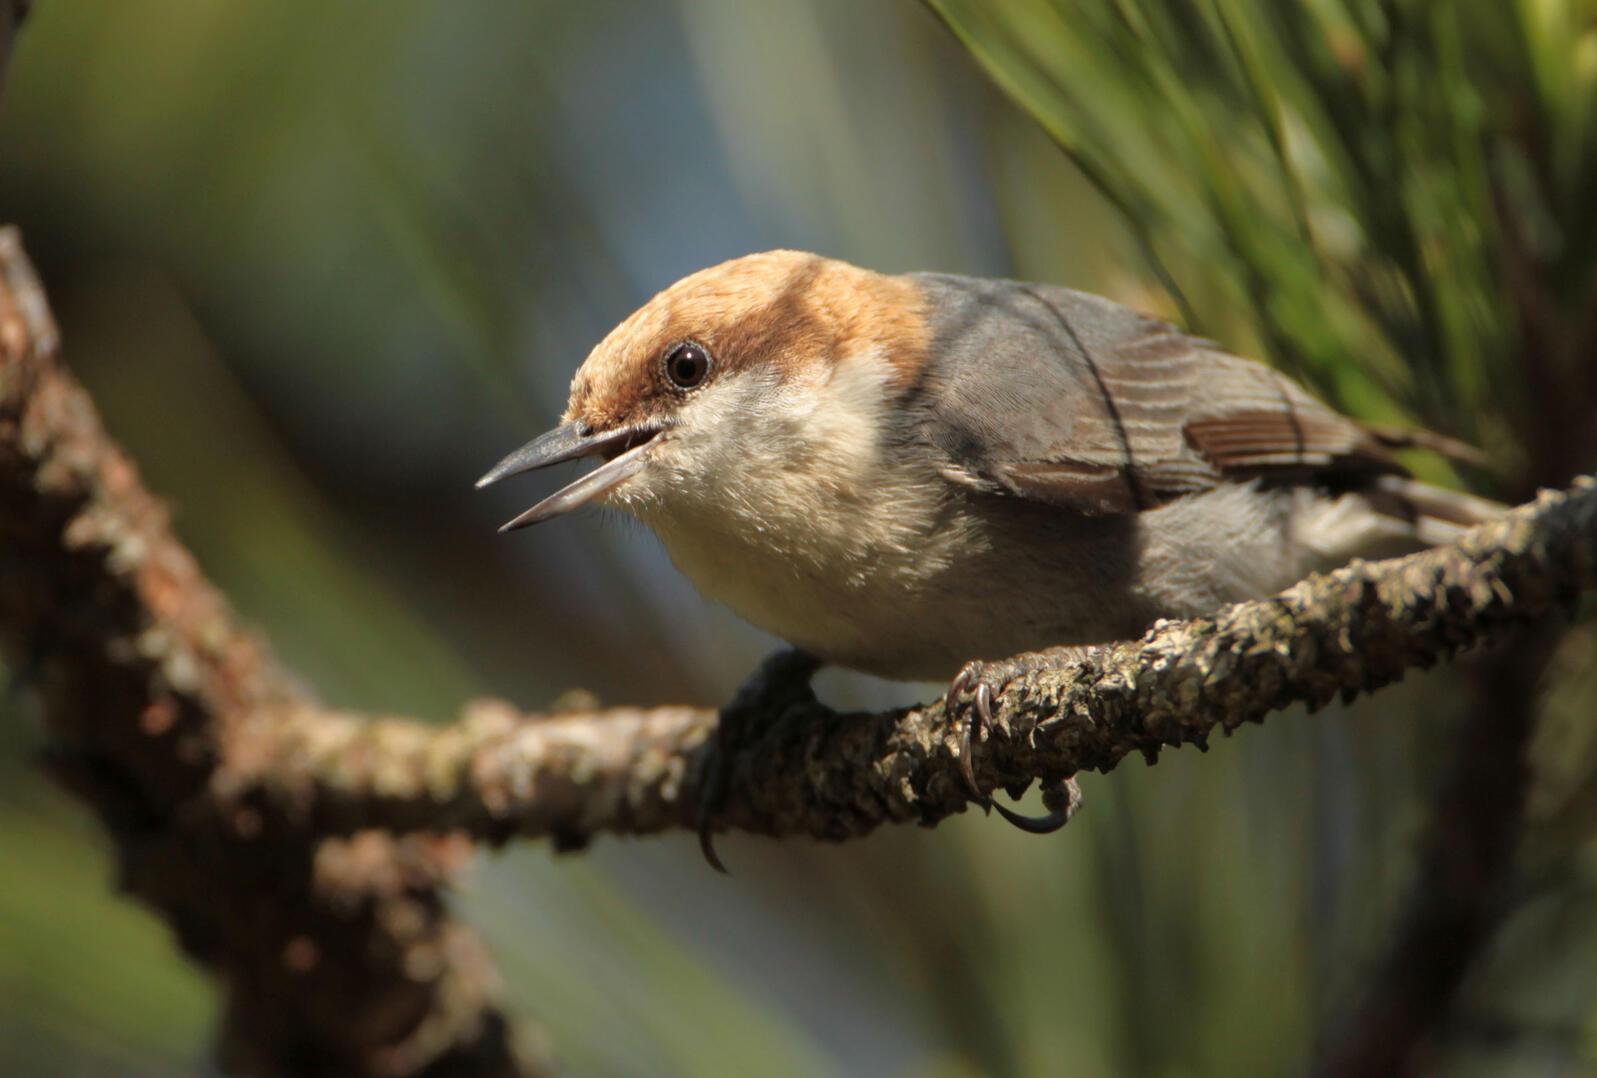 Brown-headed Nuthatch on a Longleaf Pine. Matt Tillett/Flickr (CC BY 2.0)